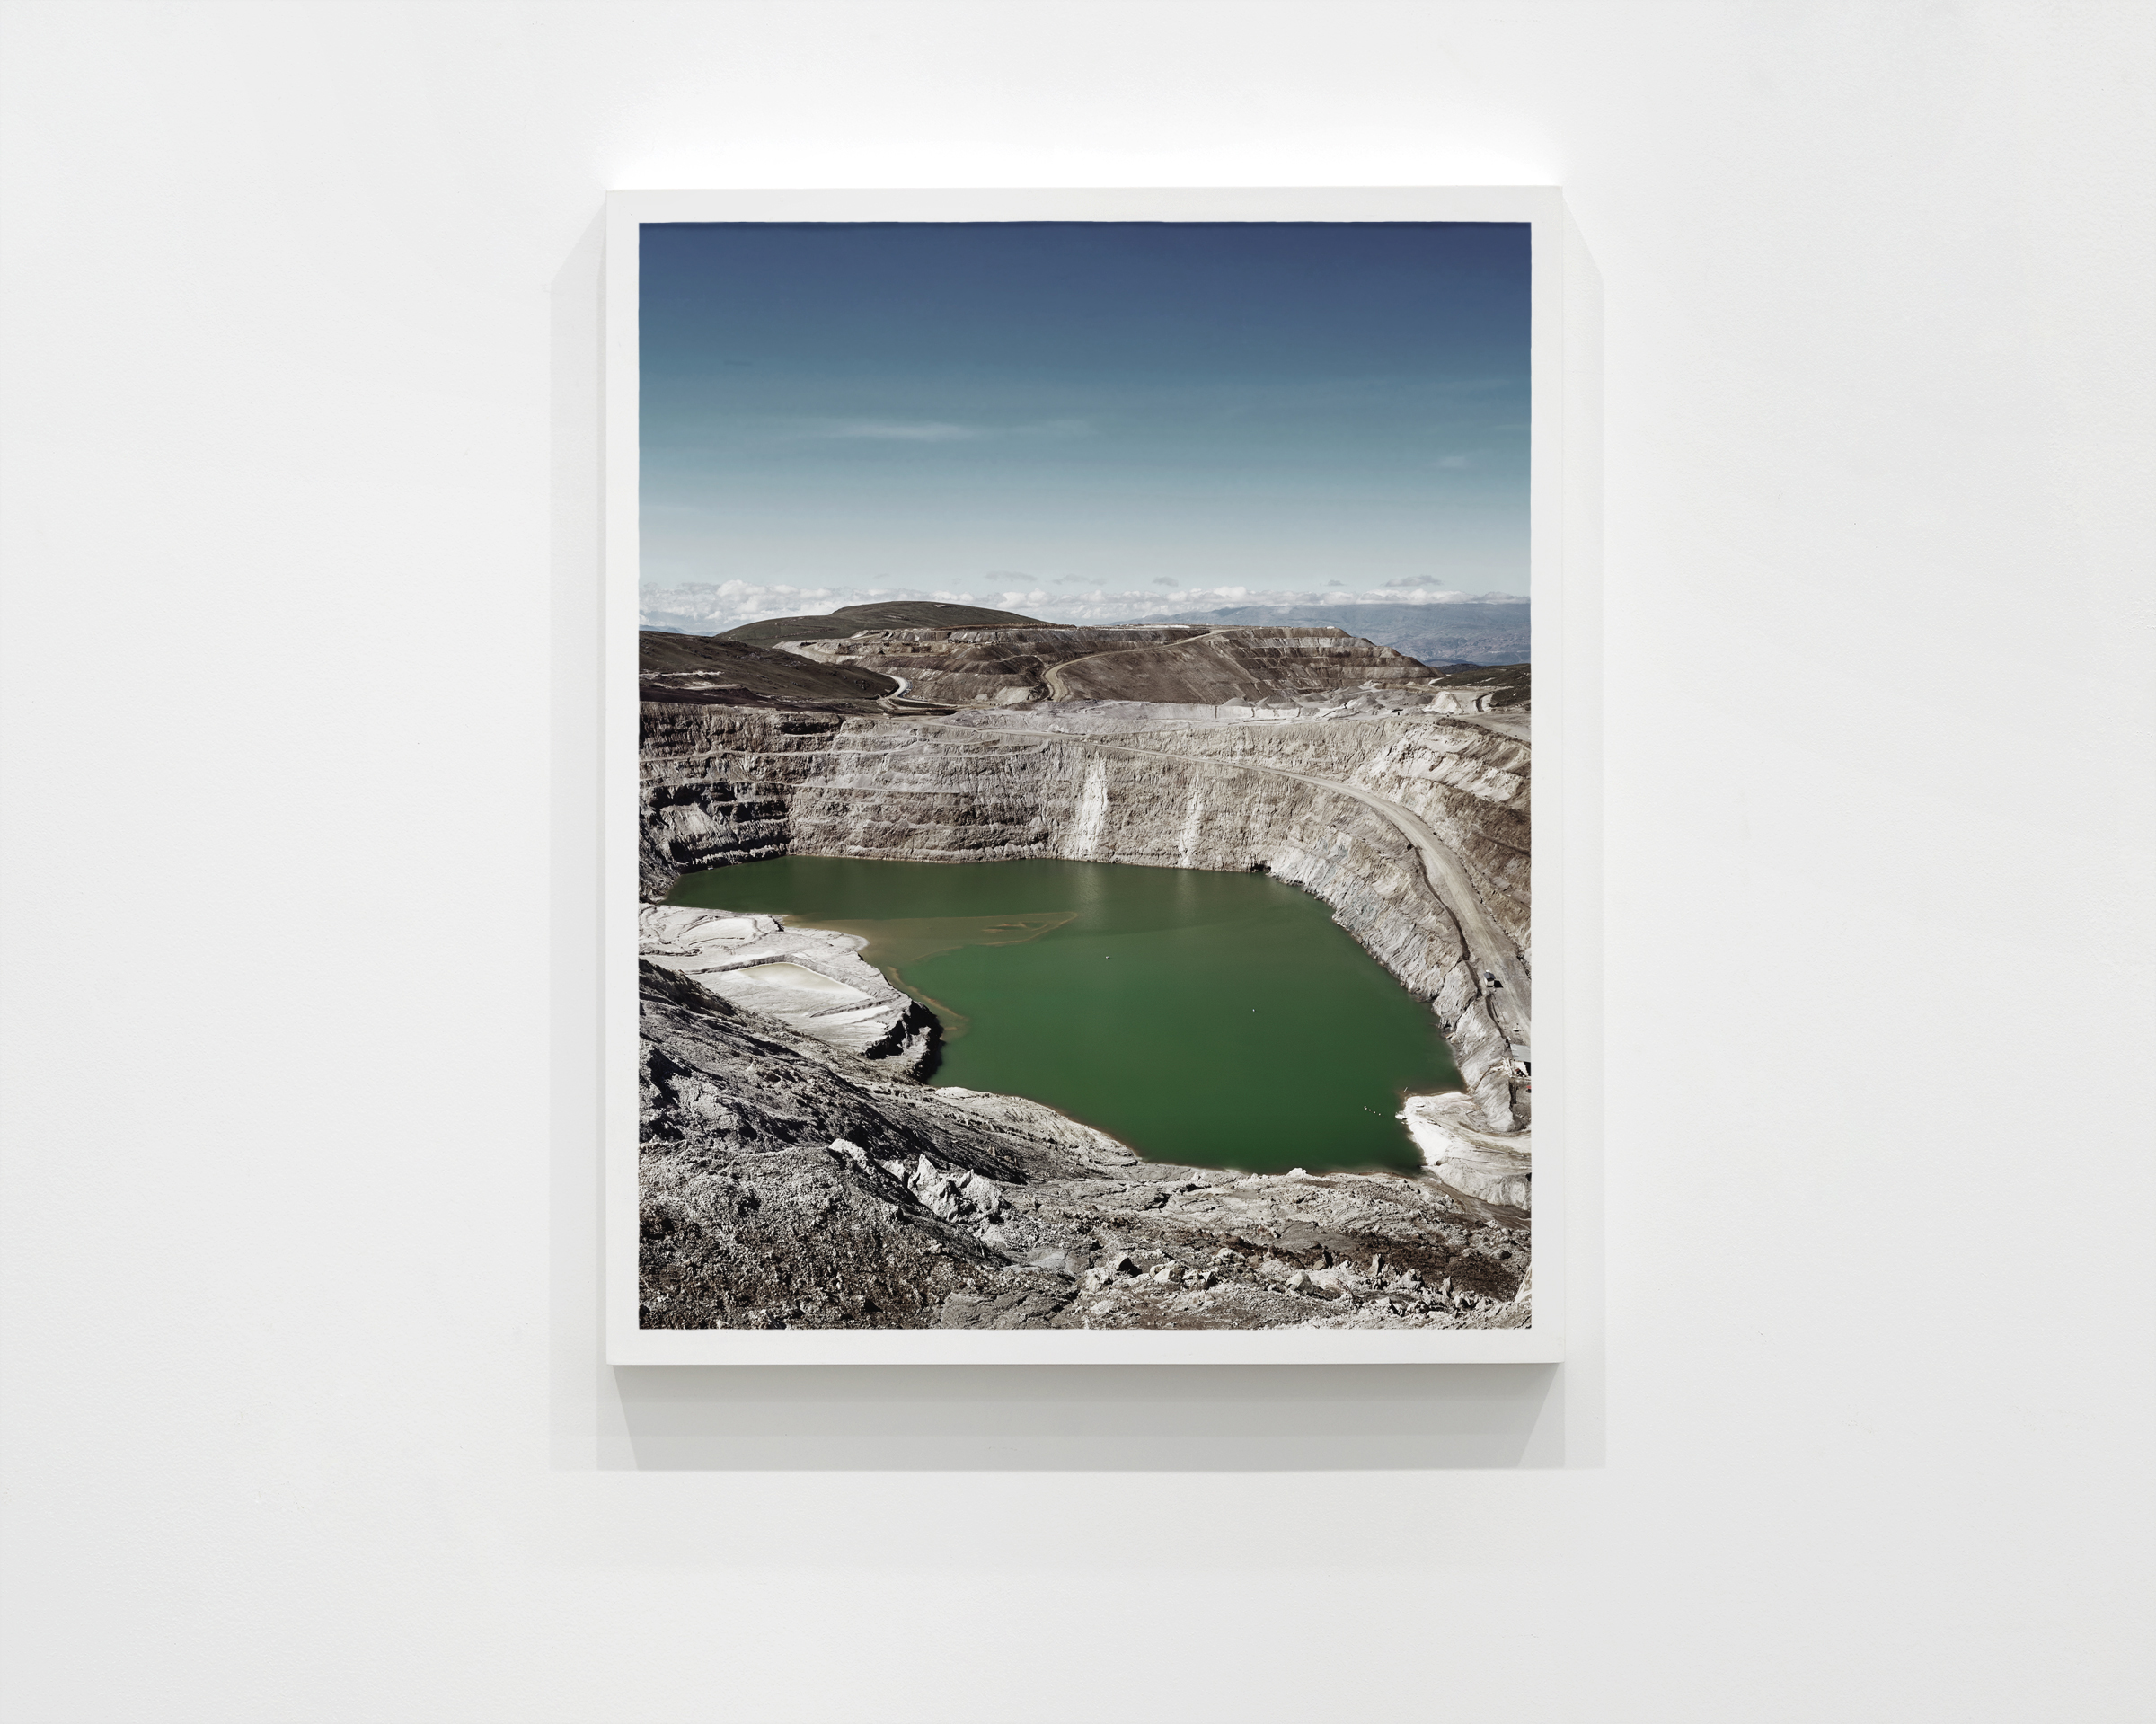 """Maqui Maqui Pit"", 2008  30 x 20 in (76.2 x 60.96 cm)"